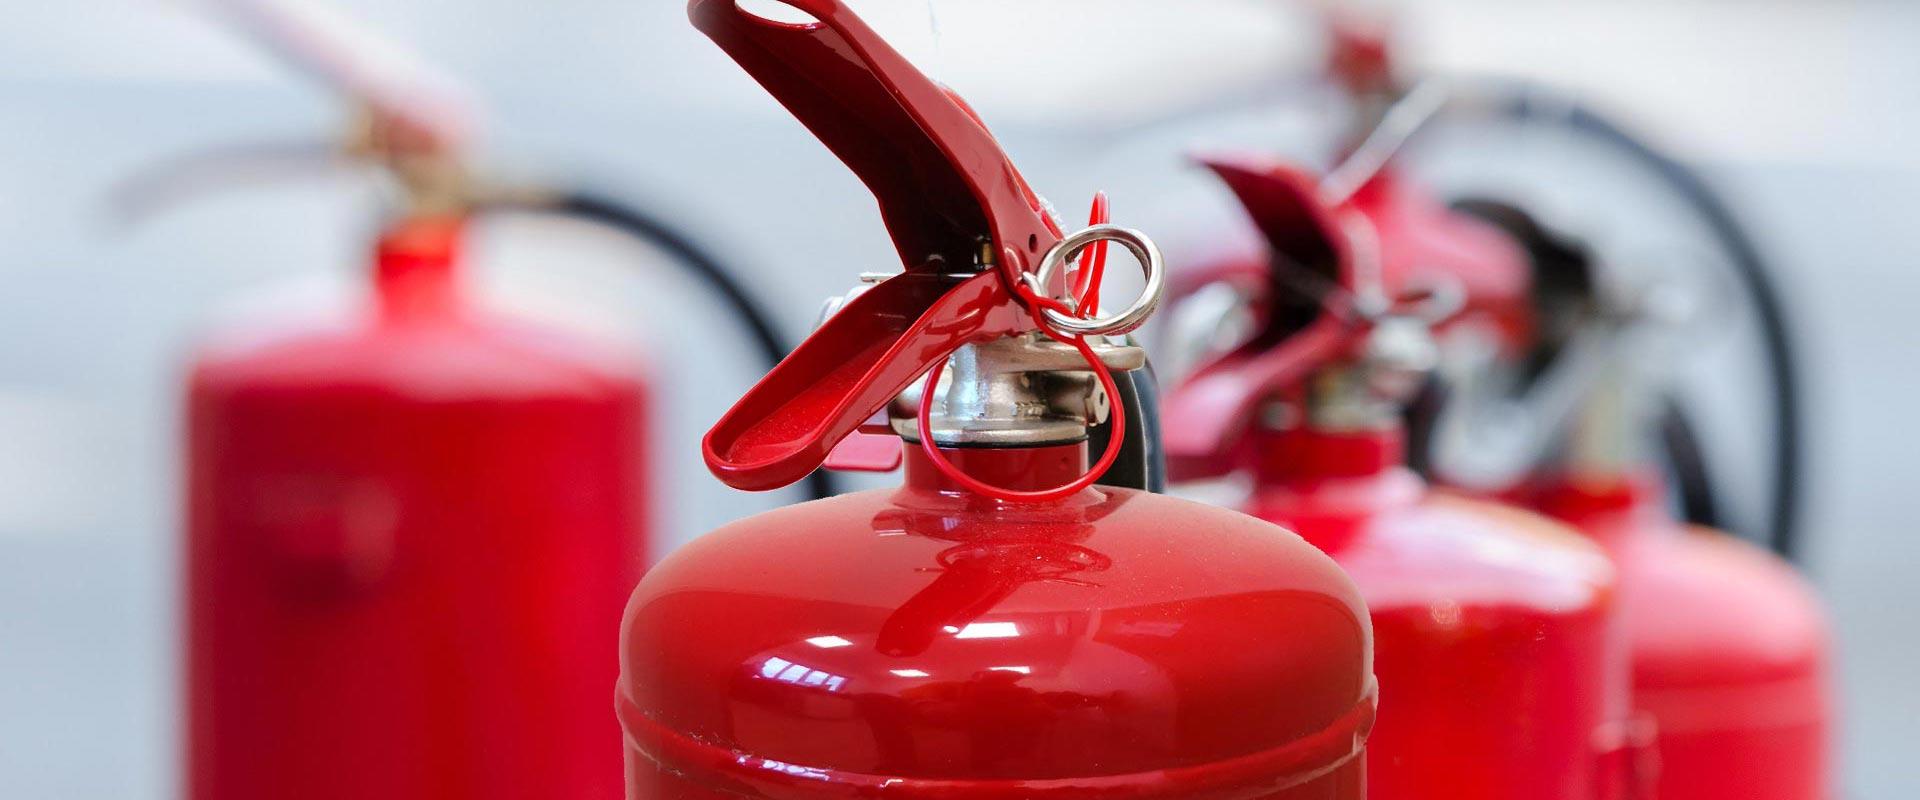 https://emme-italia.com/sites/default/files/revslider/image/emme-antincendio-srl-produzione-estintori-omologati--3_0_.jpg